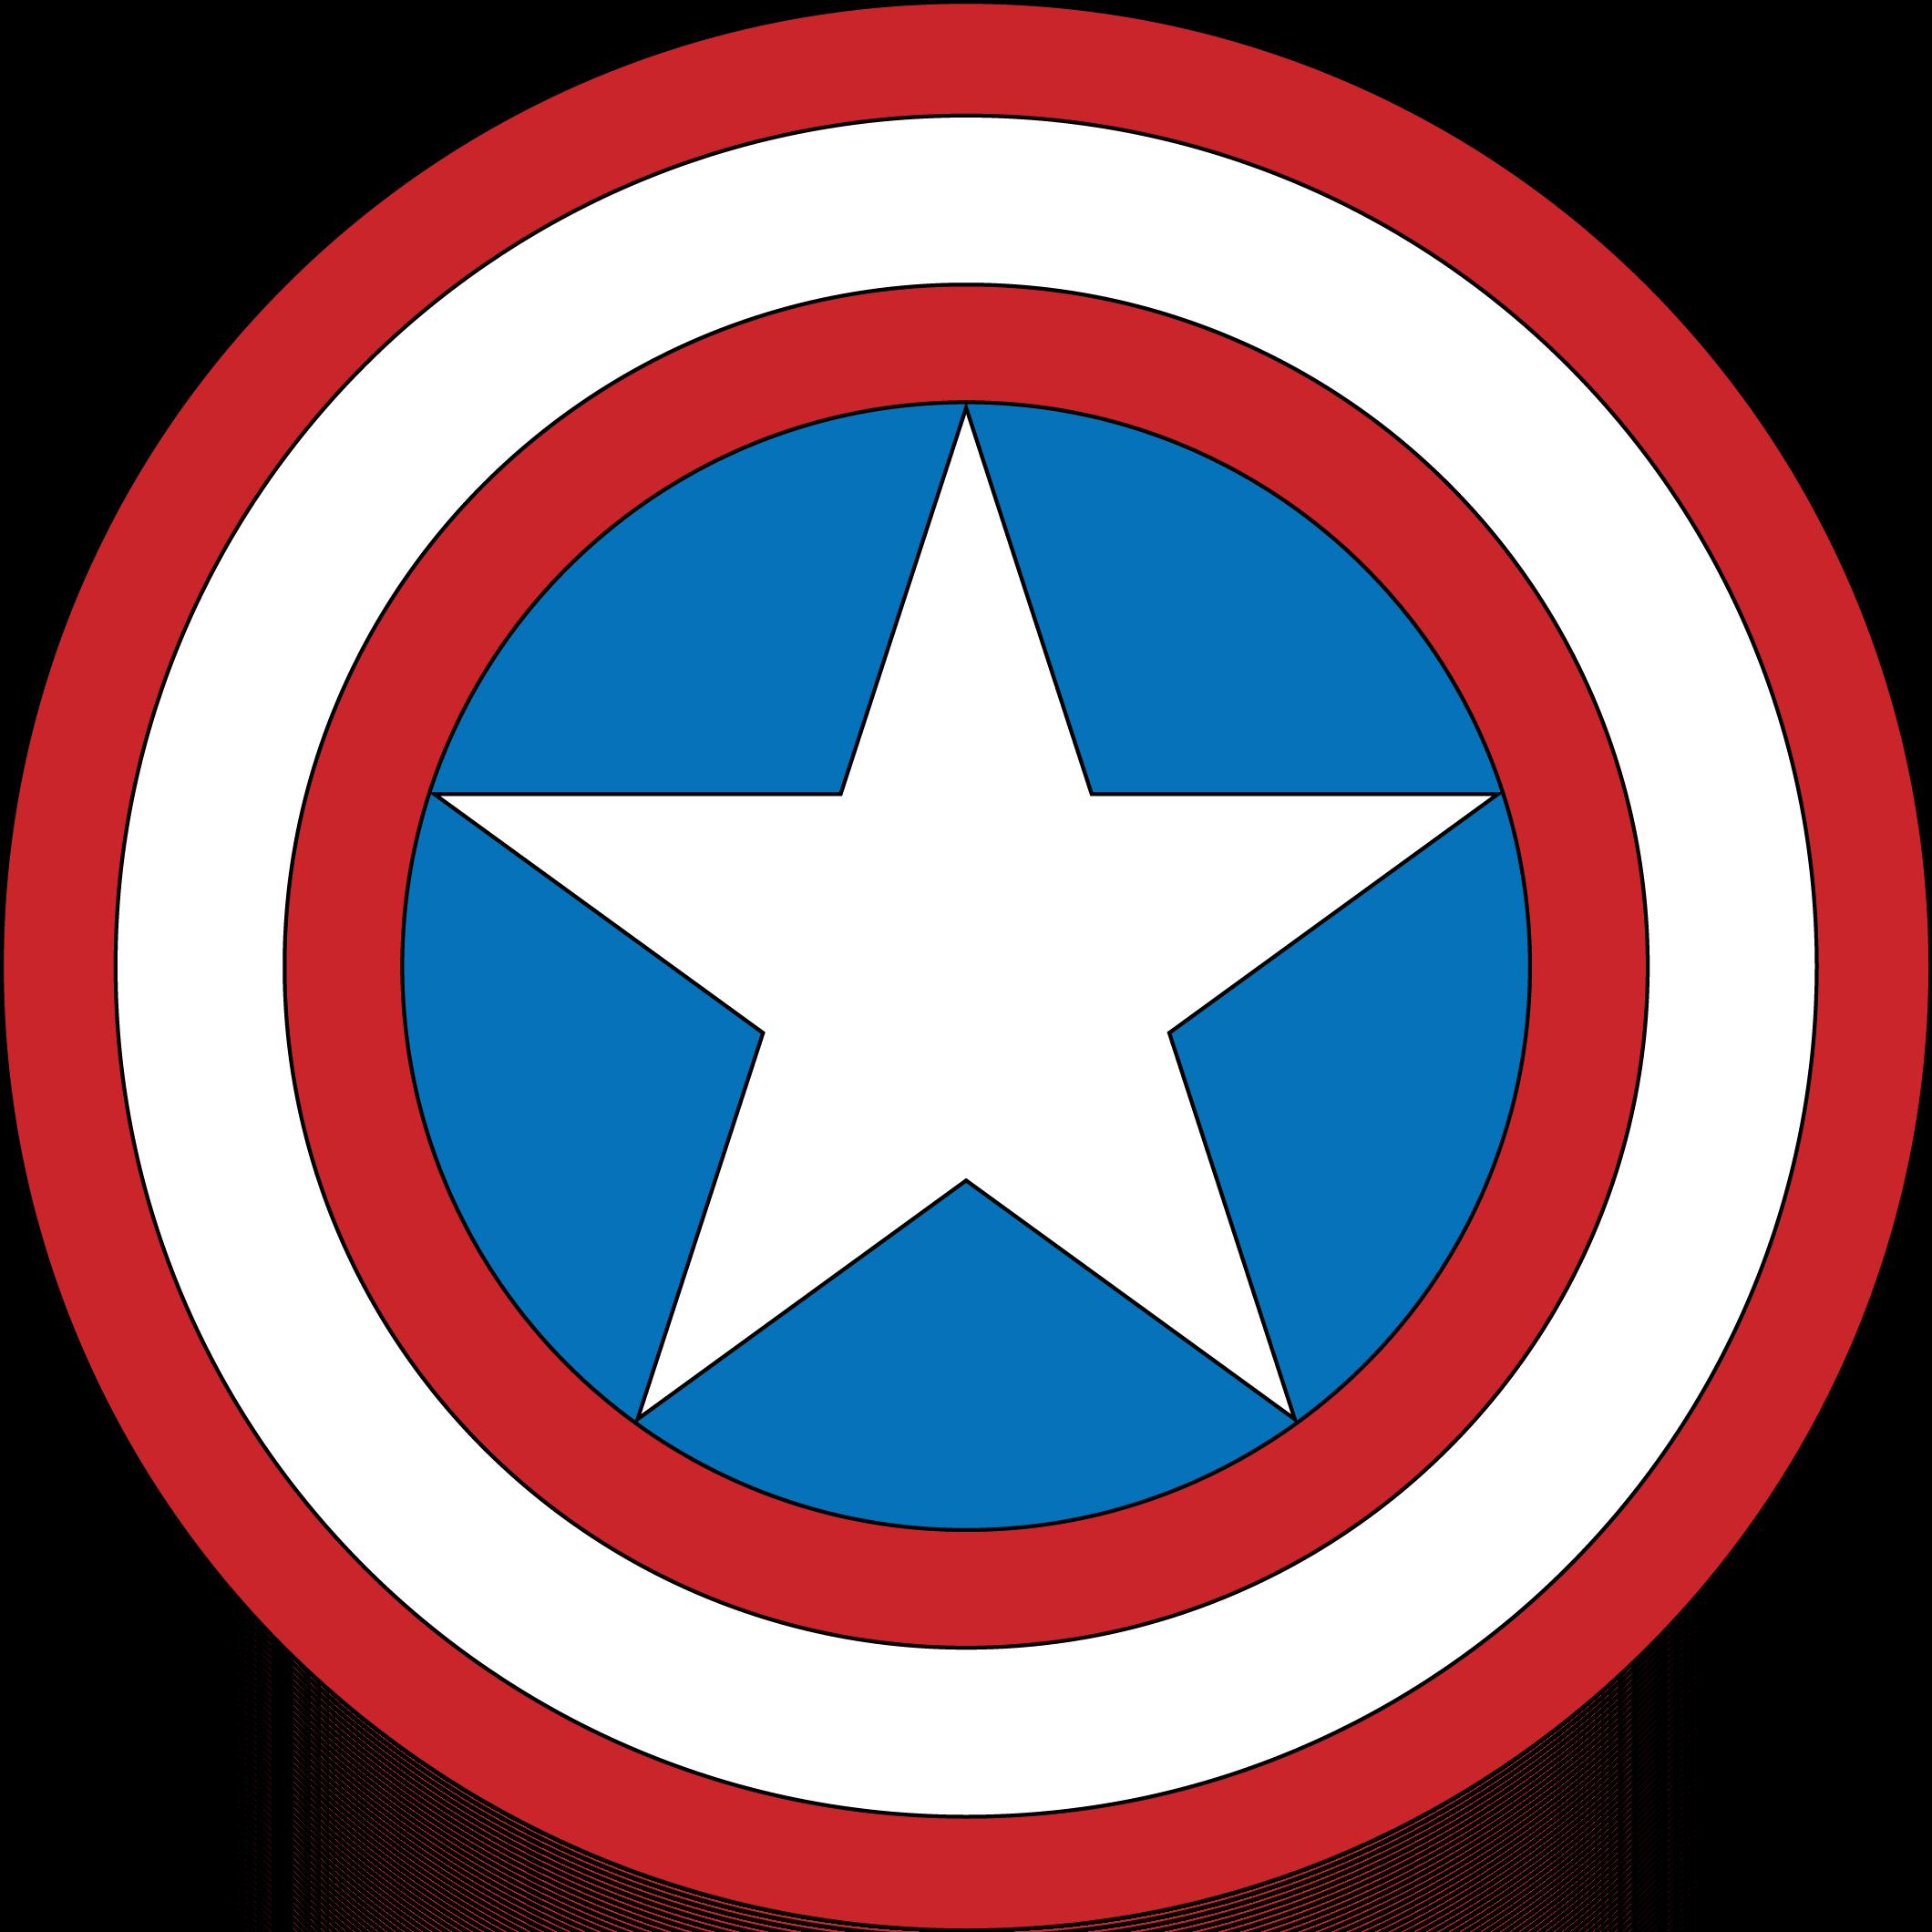 Captain marvel logo clipart clip library Captain america logo clipart - ClipartFest clip library